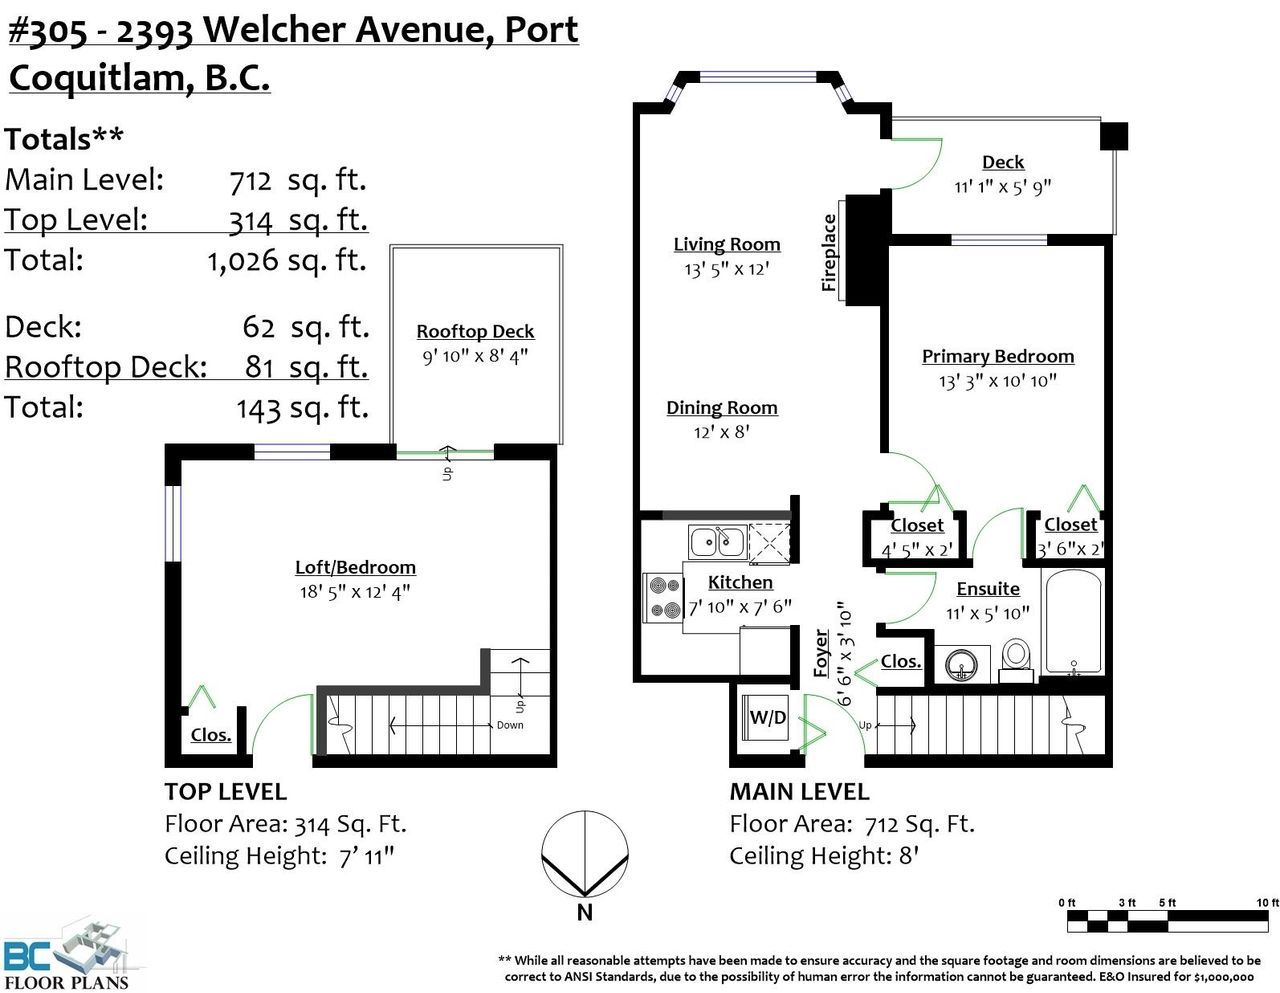 2393-welcher-avenue-central-pt-coquitlam-port-coquitlam-22 at 305 - 2393 Welcher Avenue, Central Pt Coquitlam, Port Coquitlam